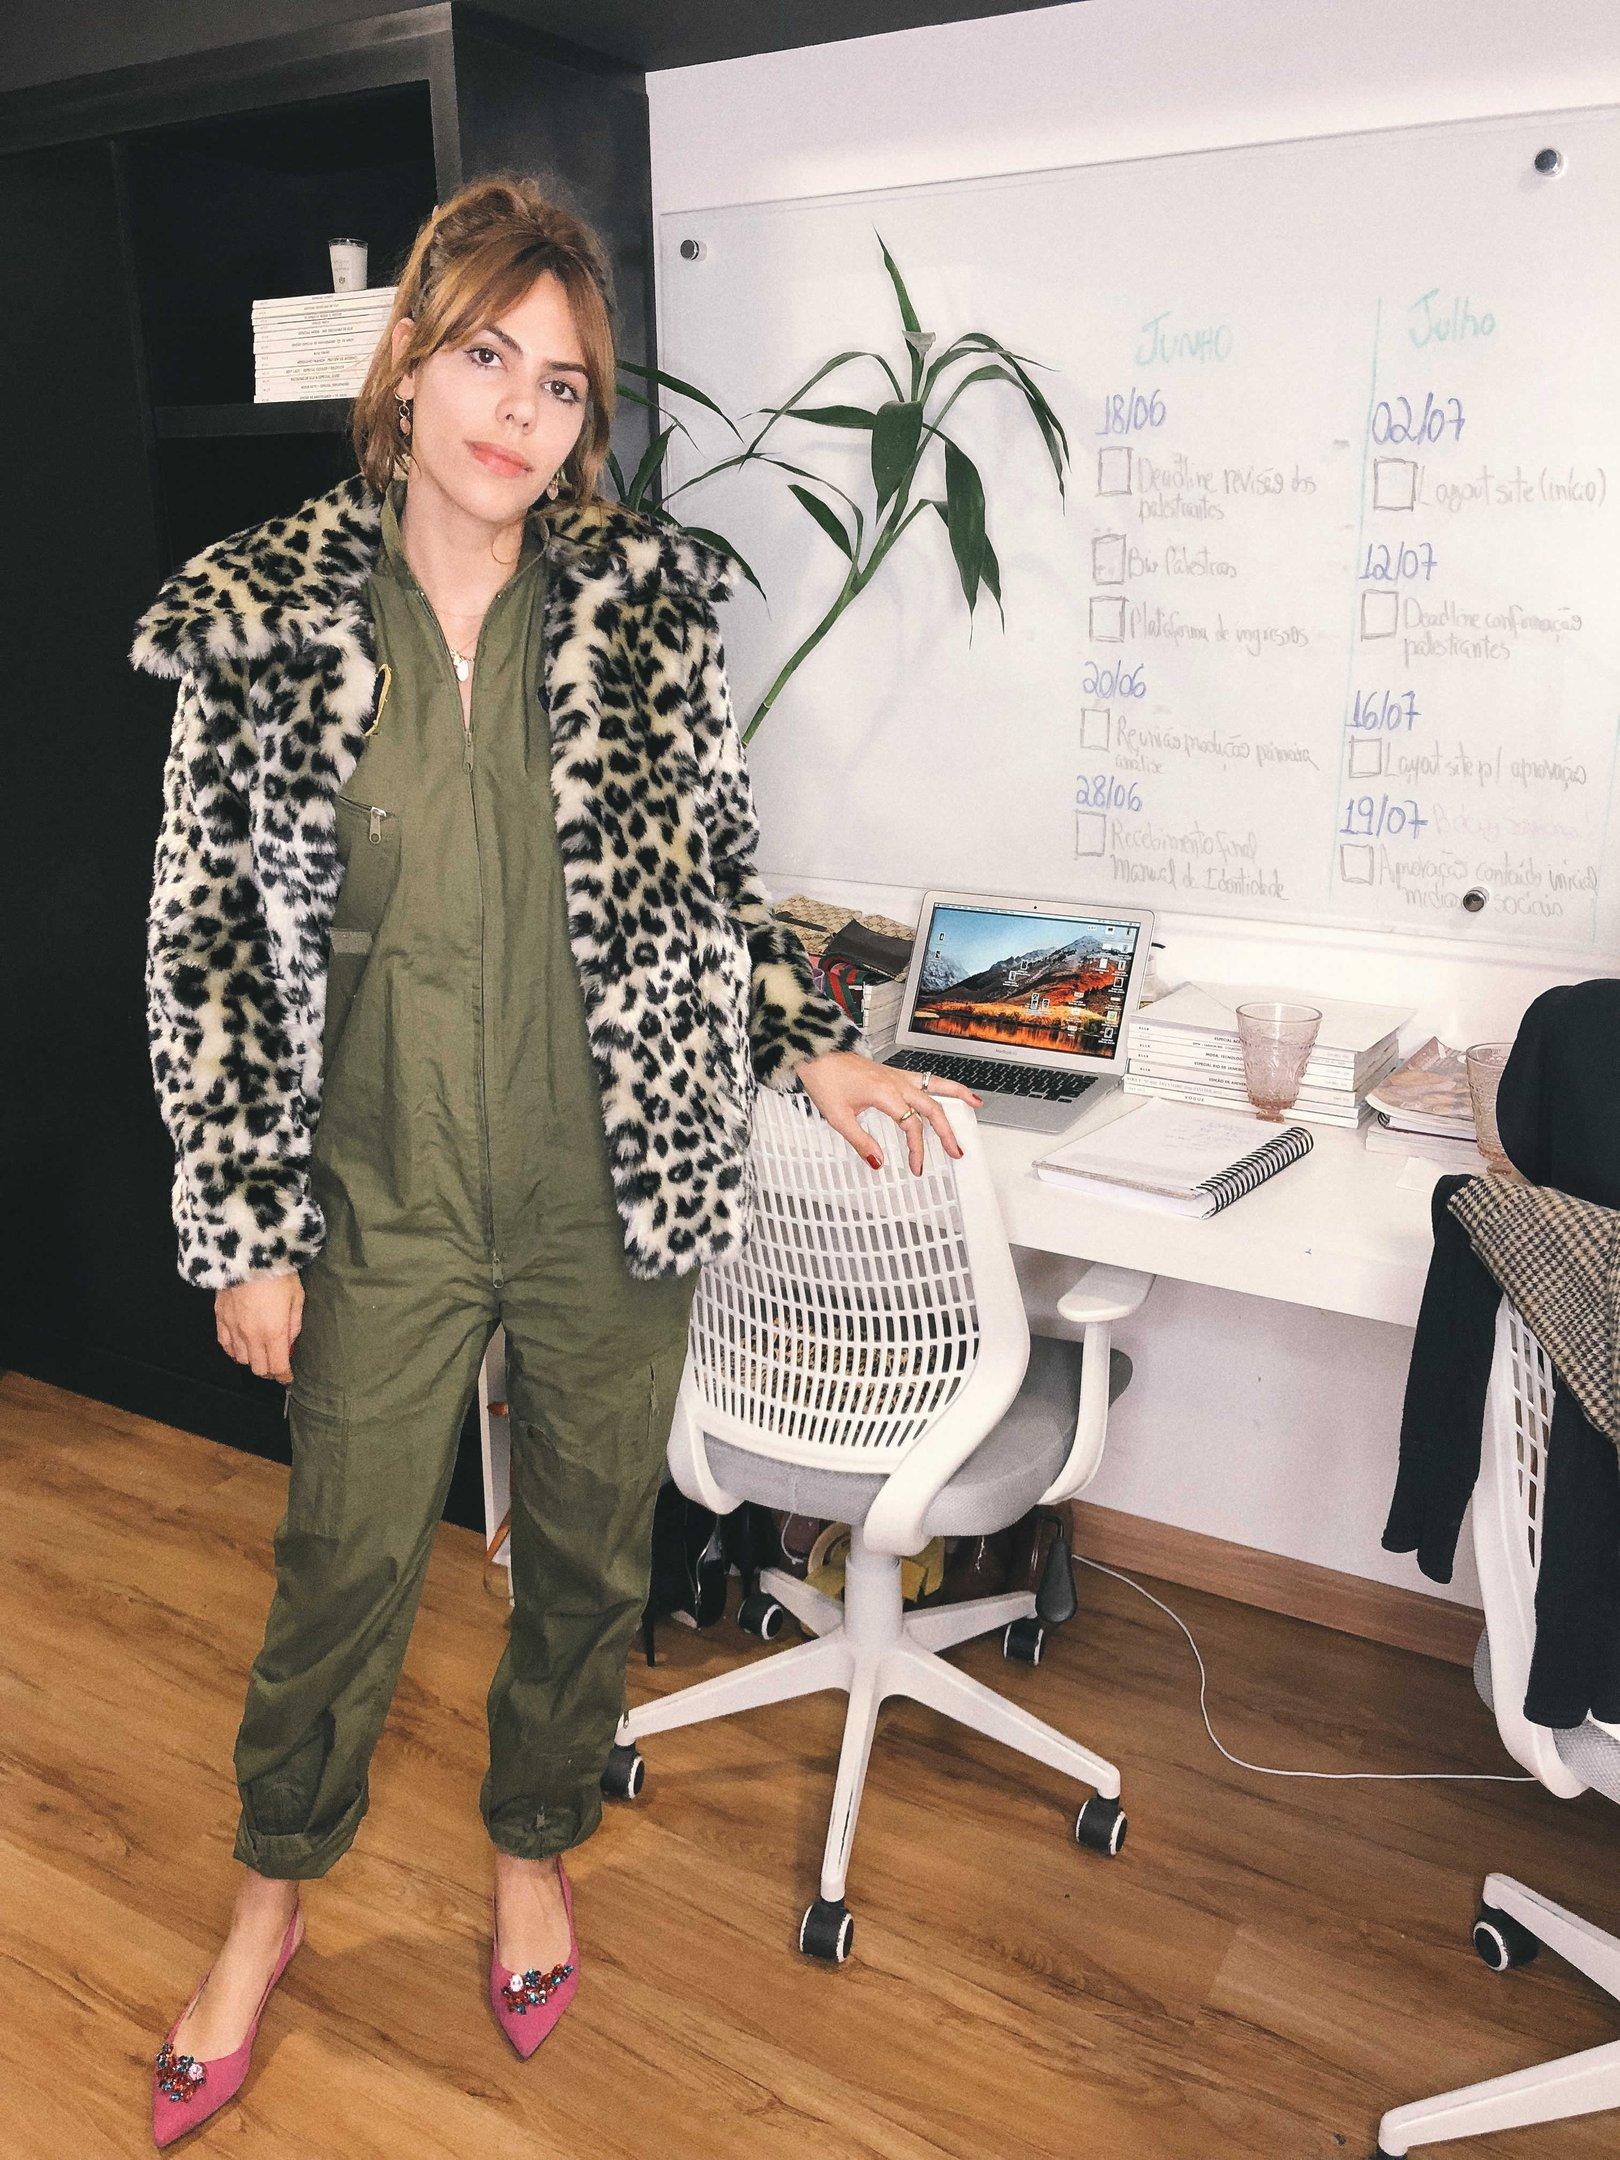 Catharina Dieterich - macacão-verde-militar-sapato-rosa-casaco-oncinha - casaco oncinha - inverno - street style